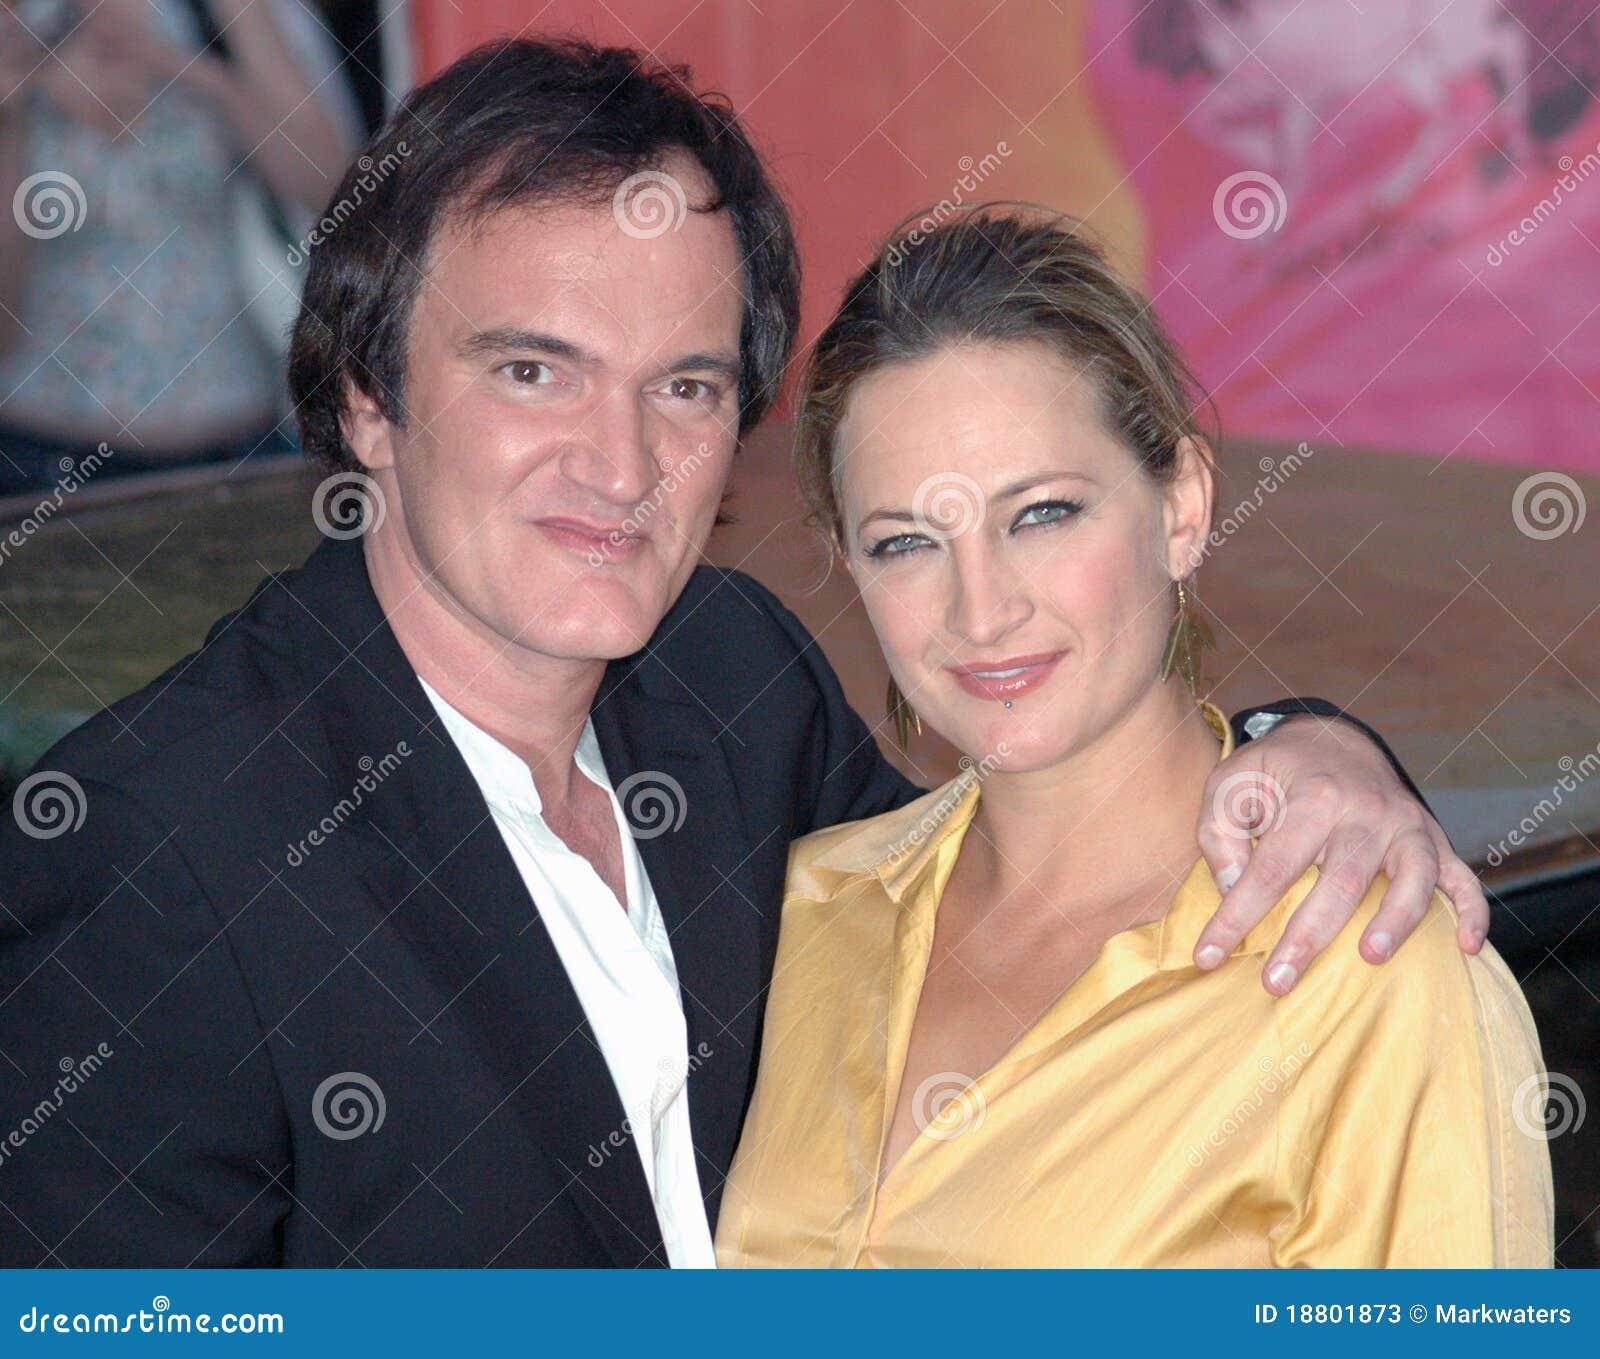 Quentin Tarantino, Zoe Bell